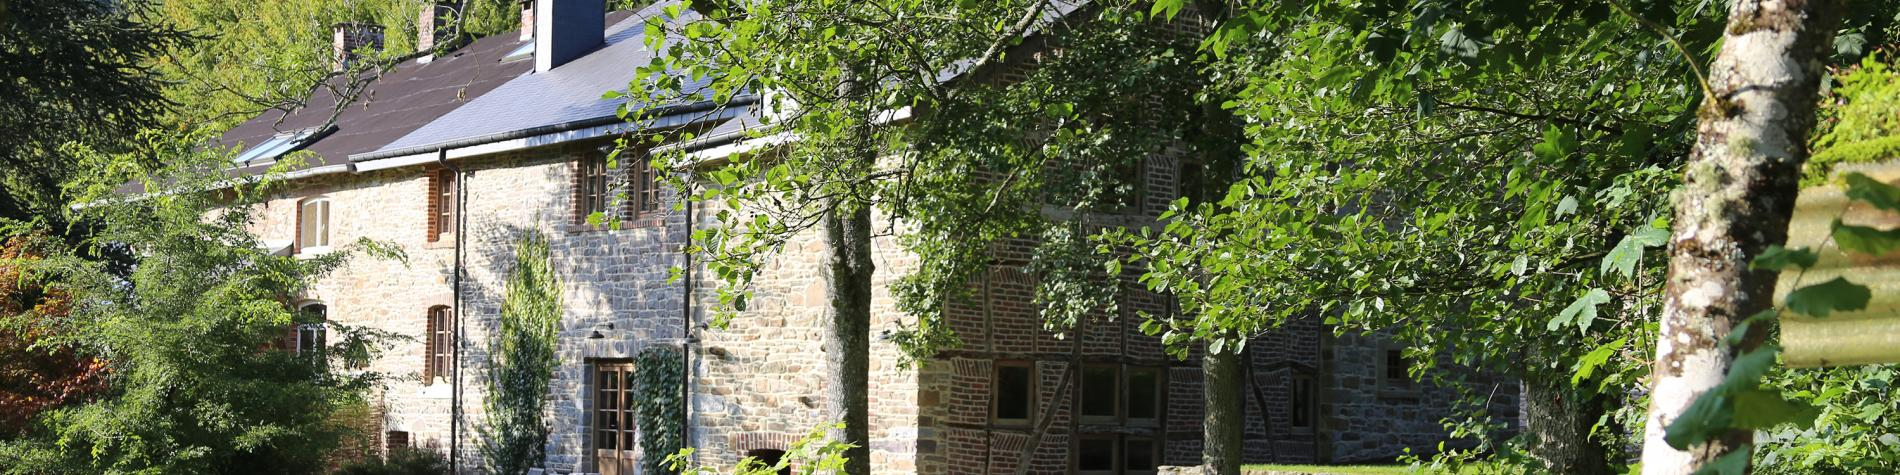 Ardenne Durbuy lodgings house getaway